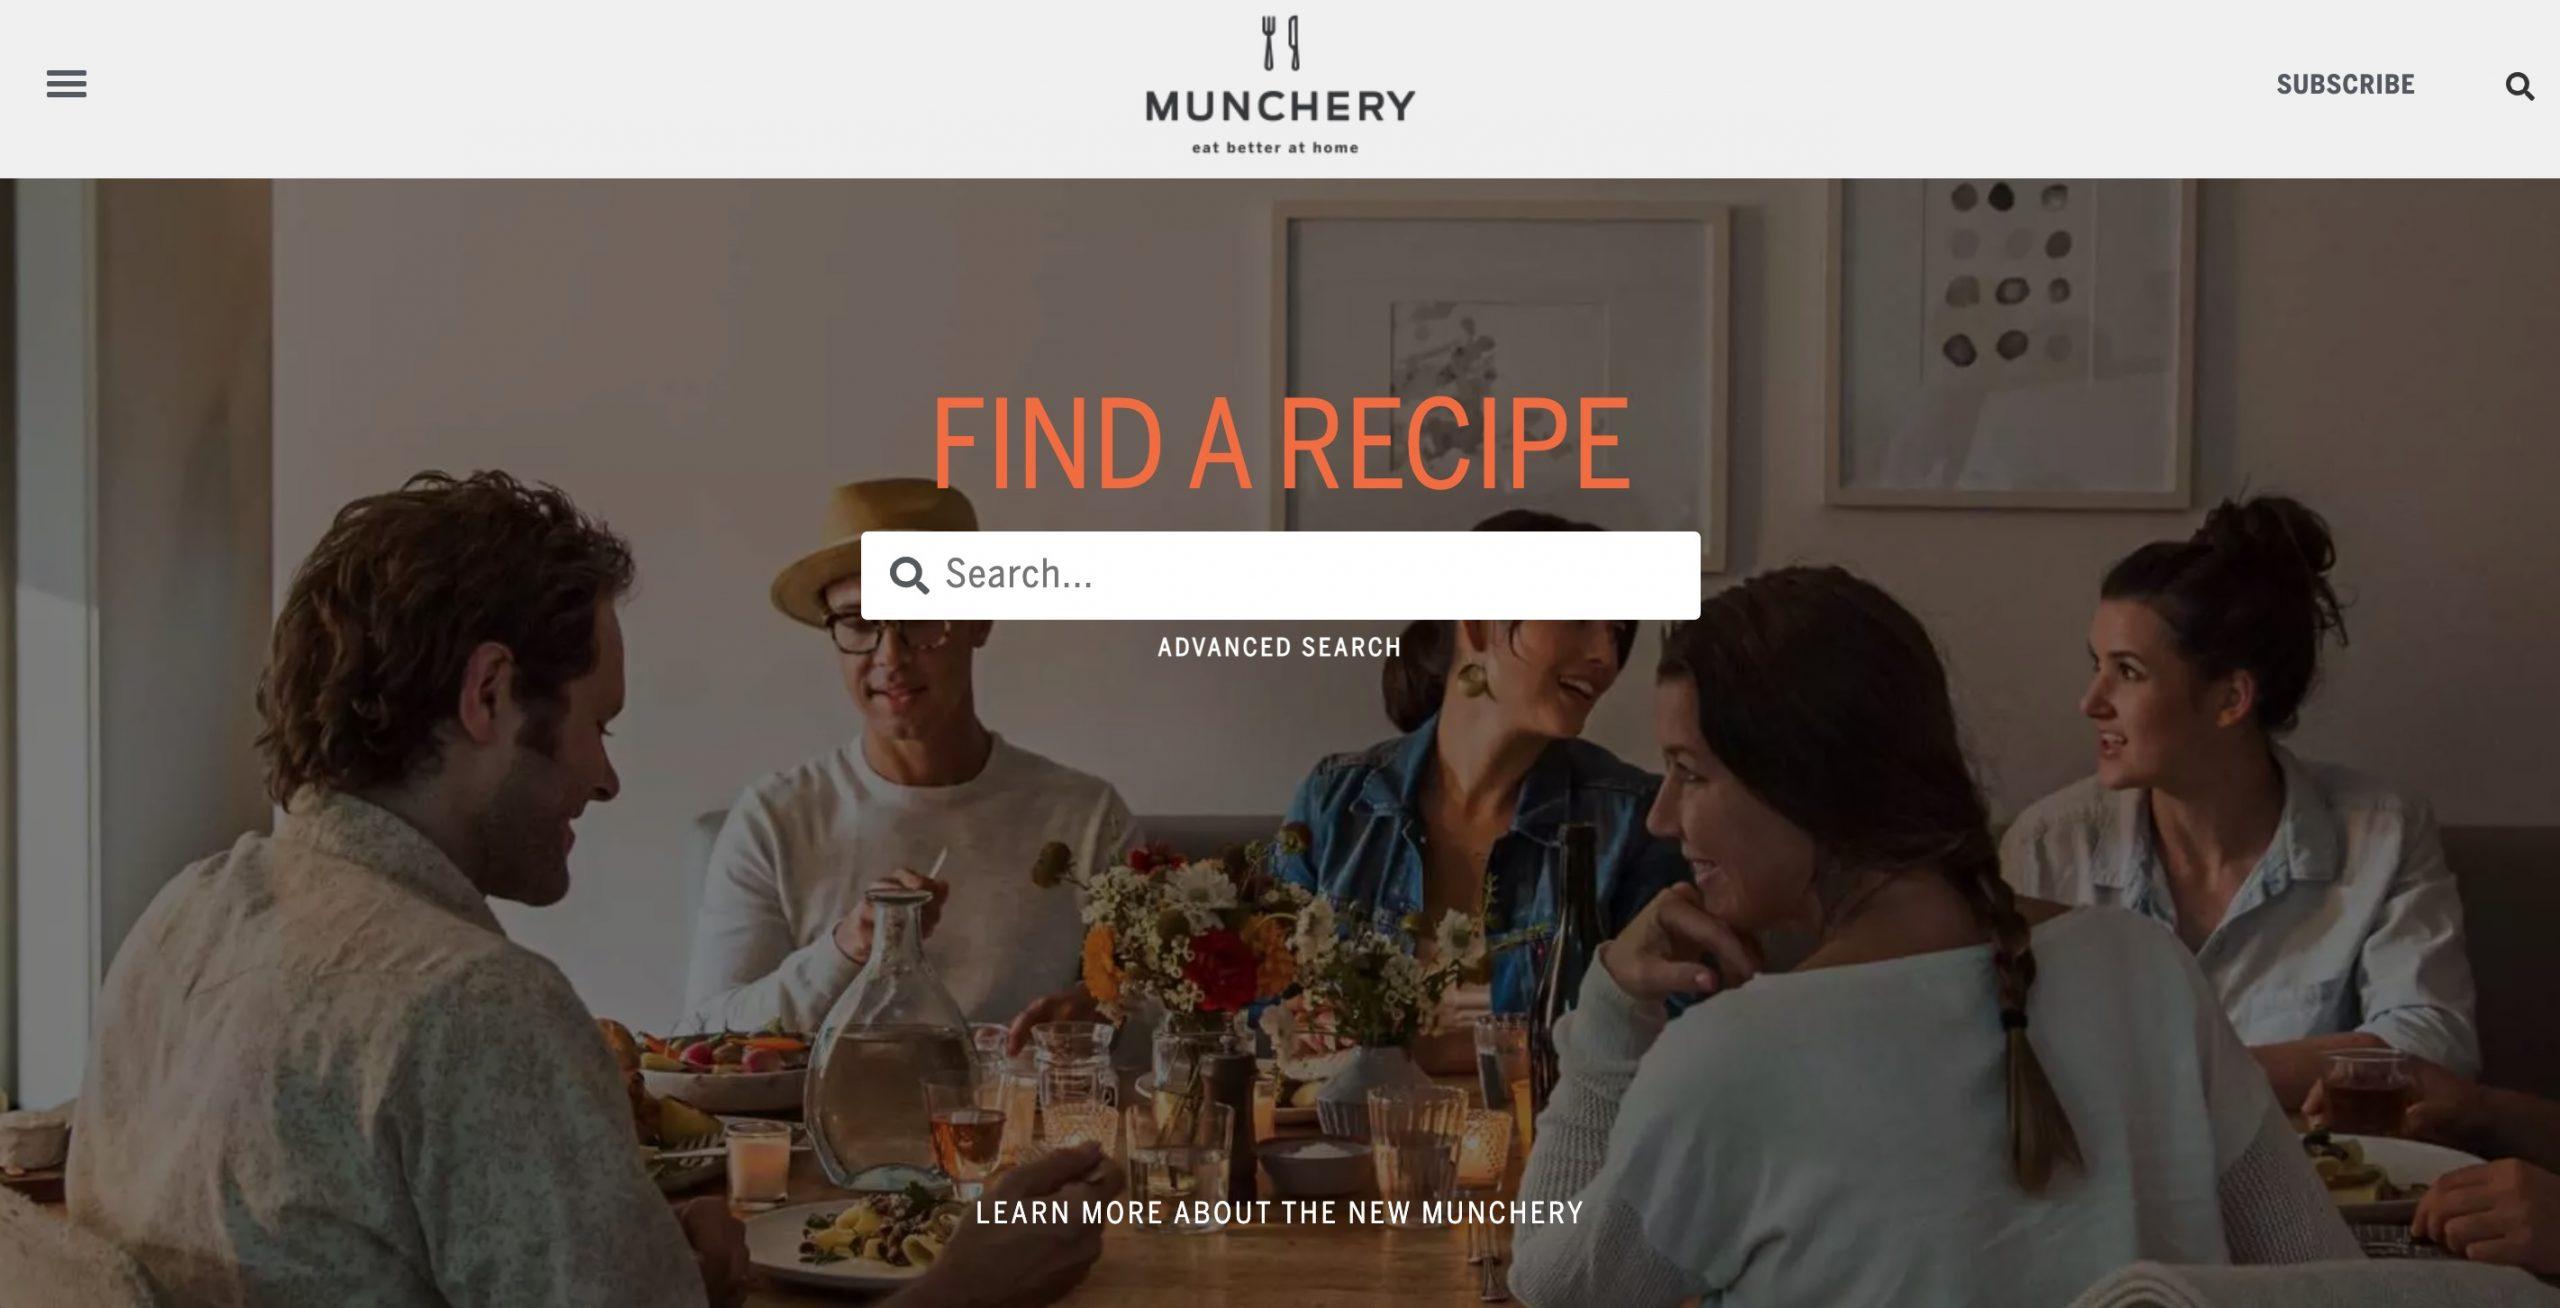 munchery main page